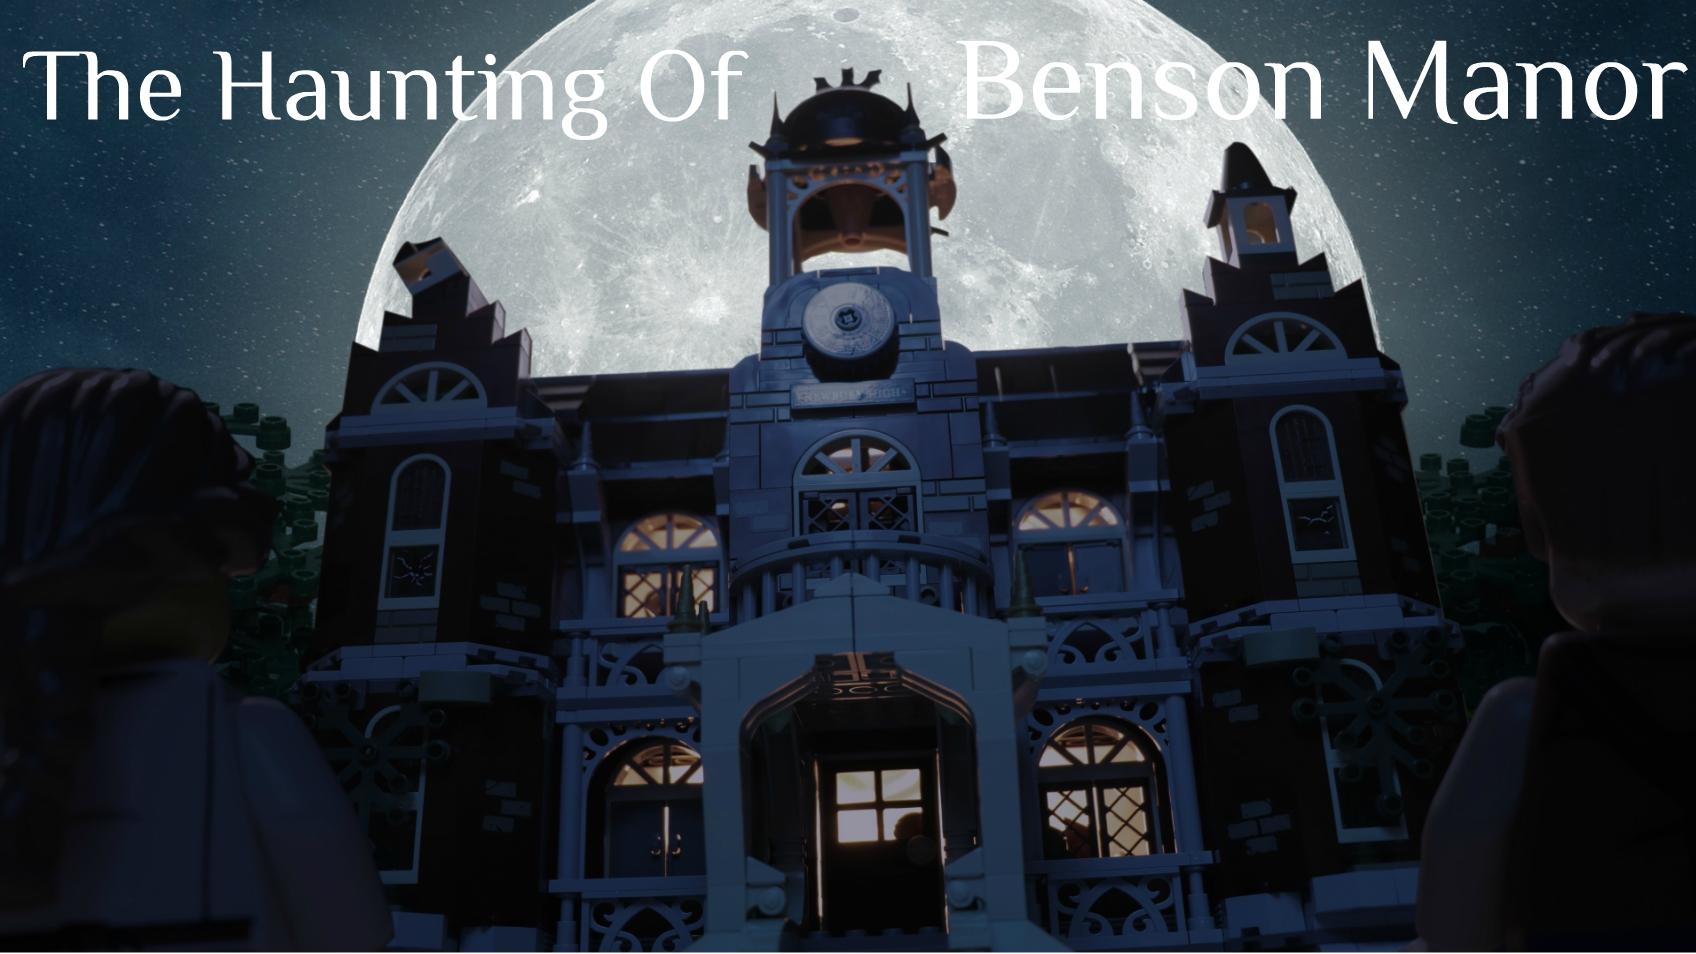 The Haunting Of Benson Manor